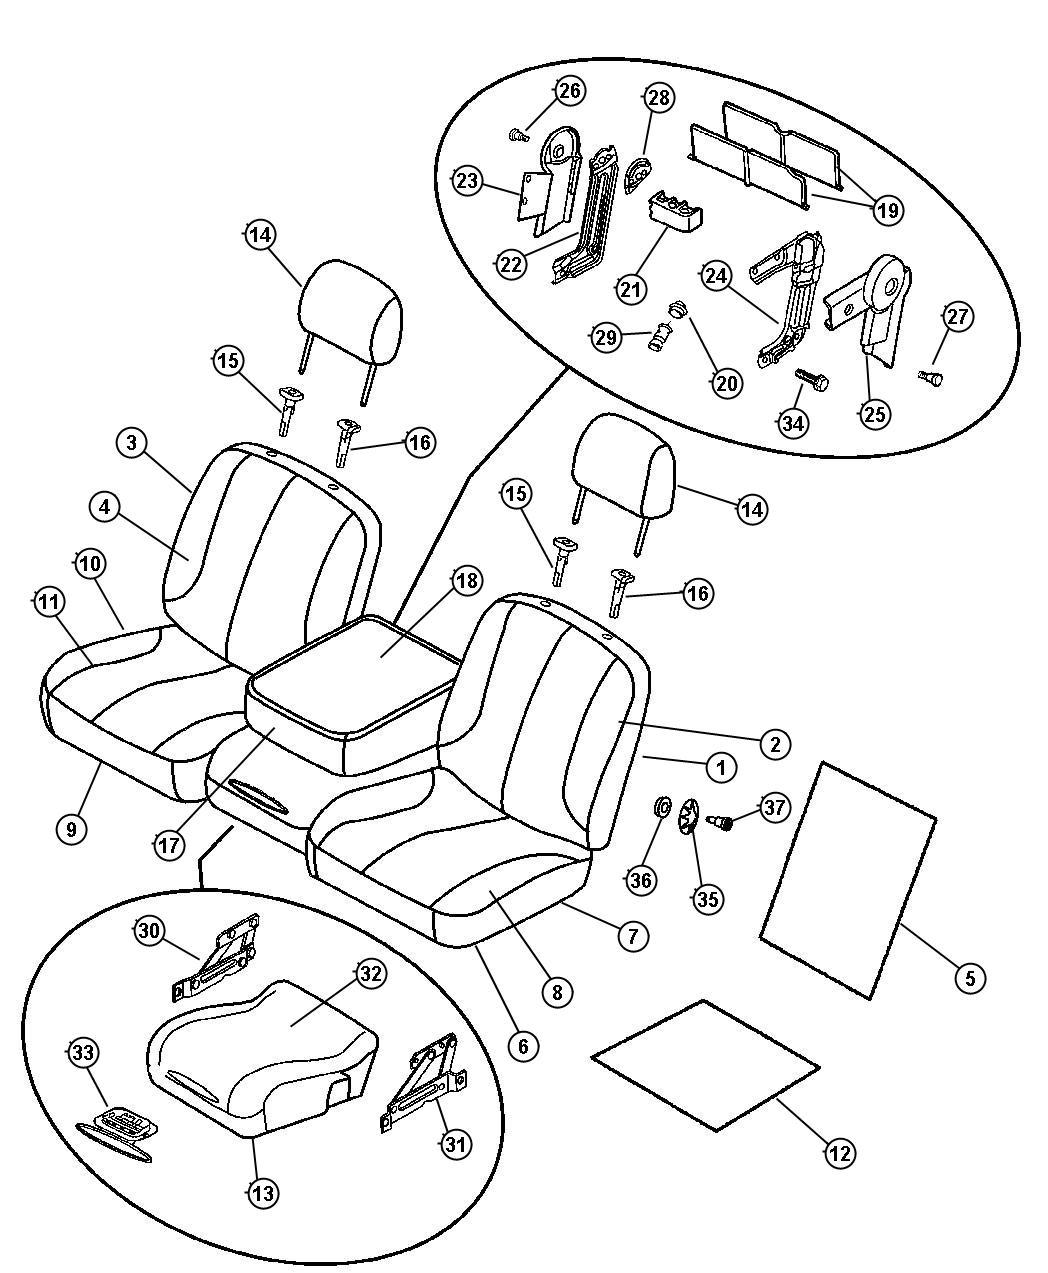 Dodge Ram 3500 Console. Seat. [d5]. Trim: [leather trim 40